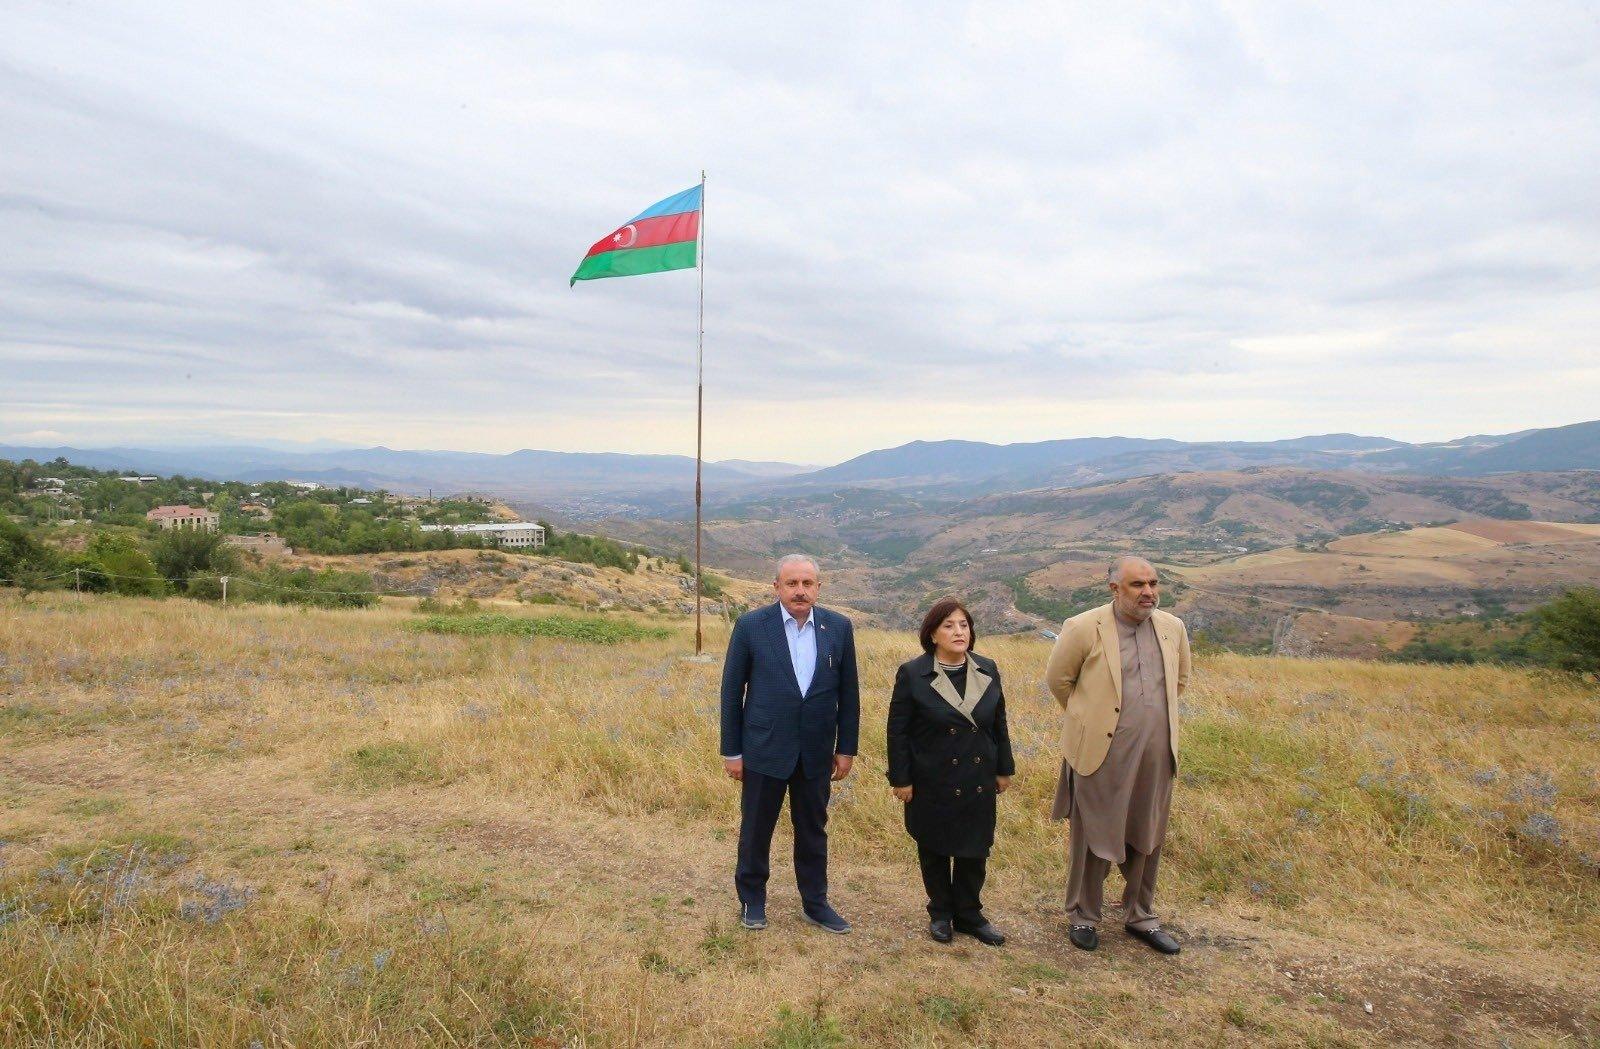 Turkey's Parliament Speaker Mustafa Şentop (L) visits Shusha, Azerbaijan, July 28,2 2021. (IHA Photo)